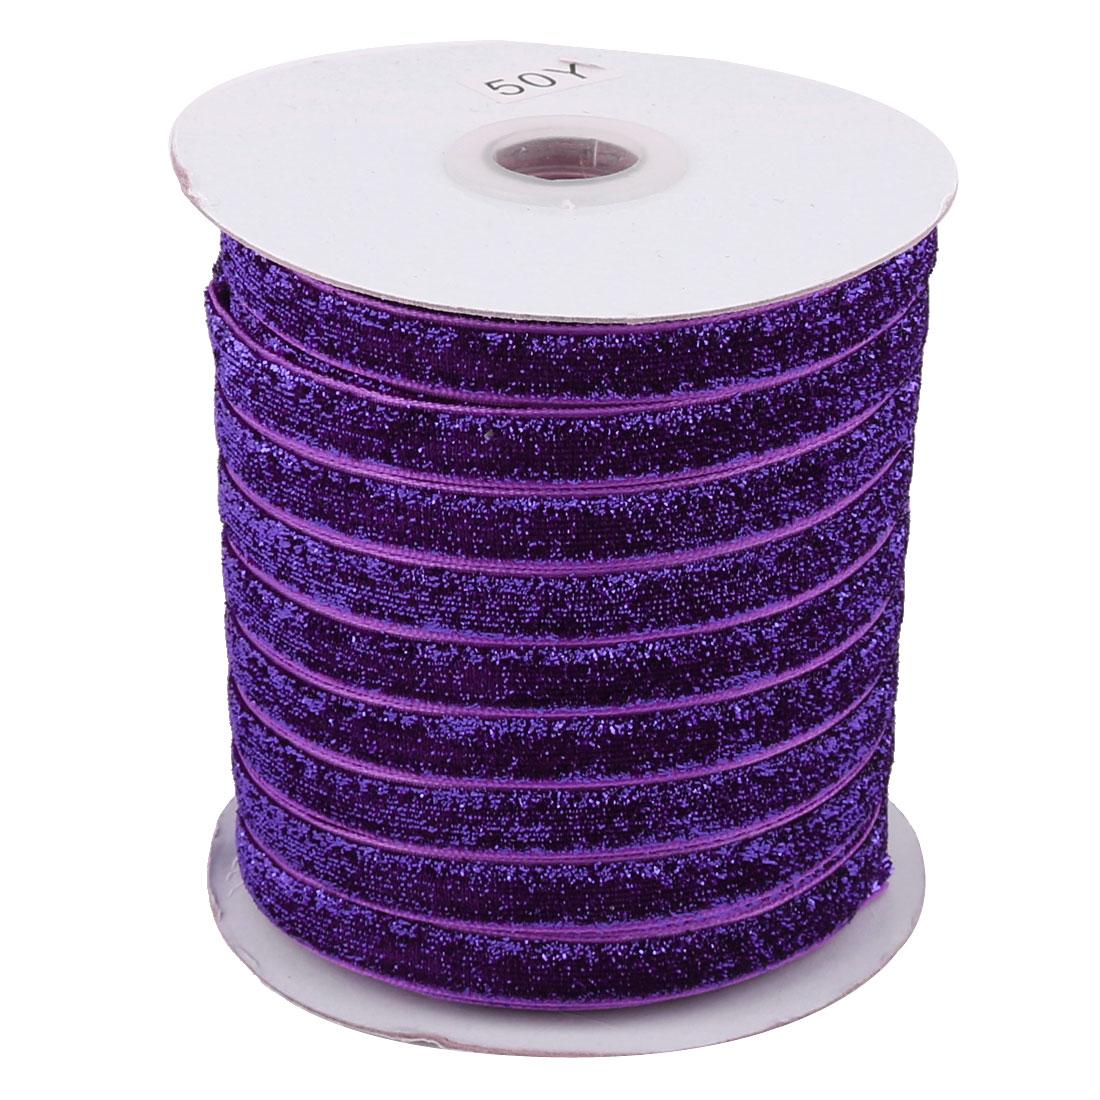 Festival Decoration Velvet Bling Ribbon DIY Gift Headband Dark Purple 50 Yard 1cm Width